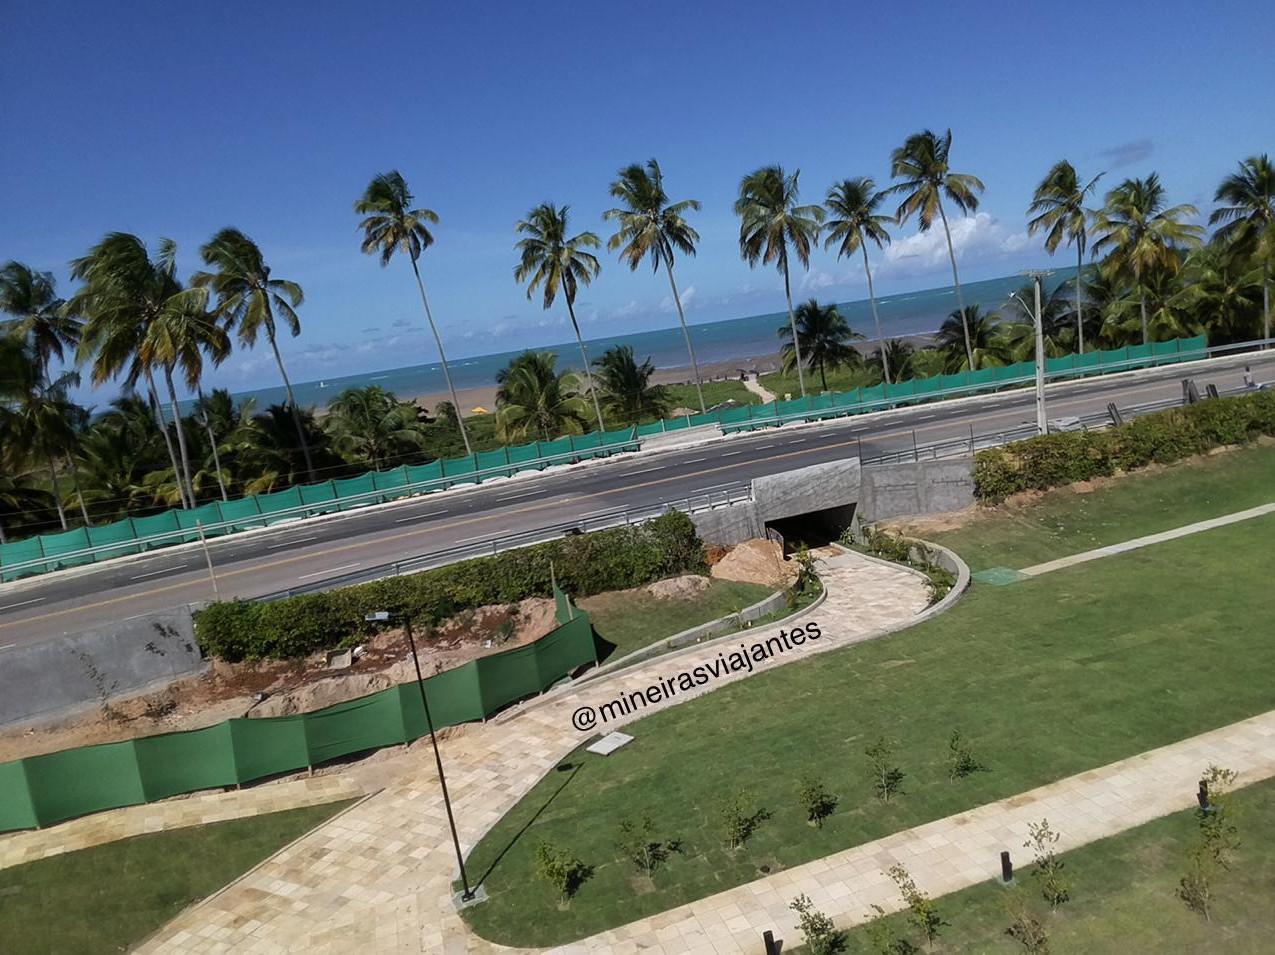 Túnel de acesso a praia